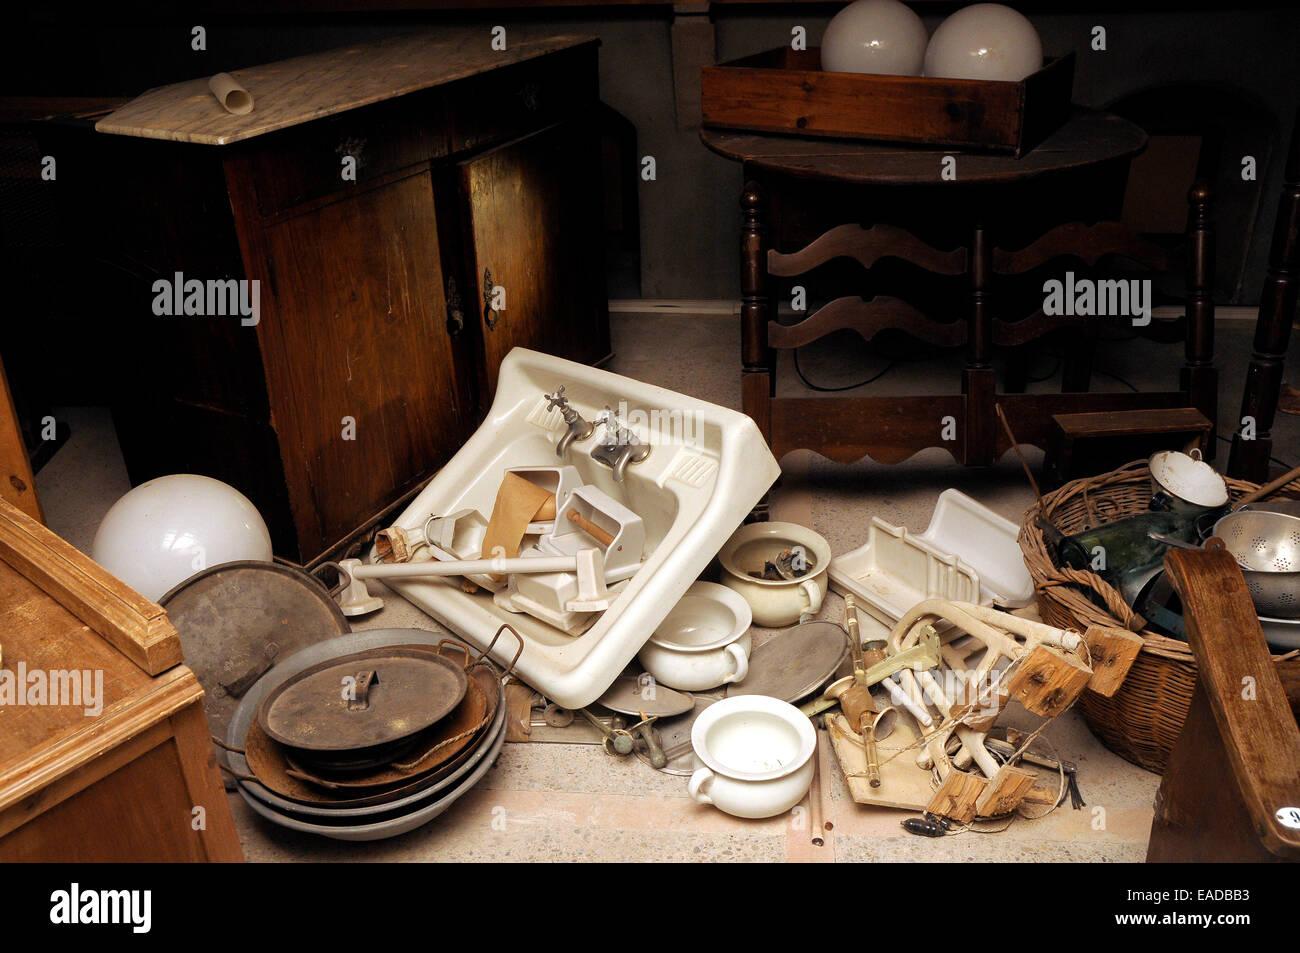 garret, old stuff,attic, old things,antic,mansard - Stock Image